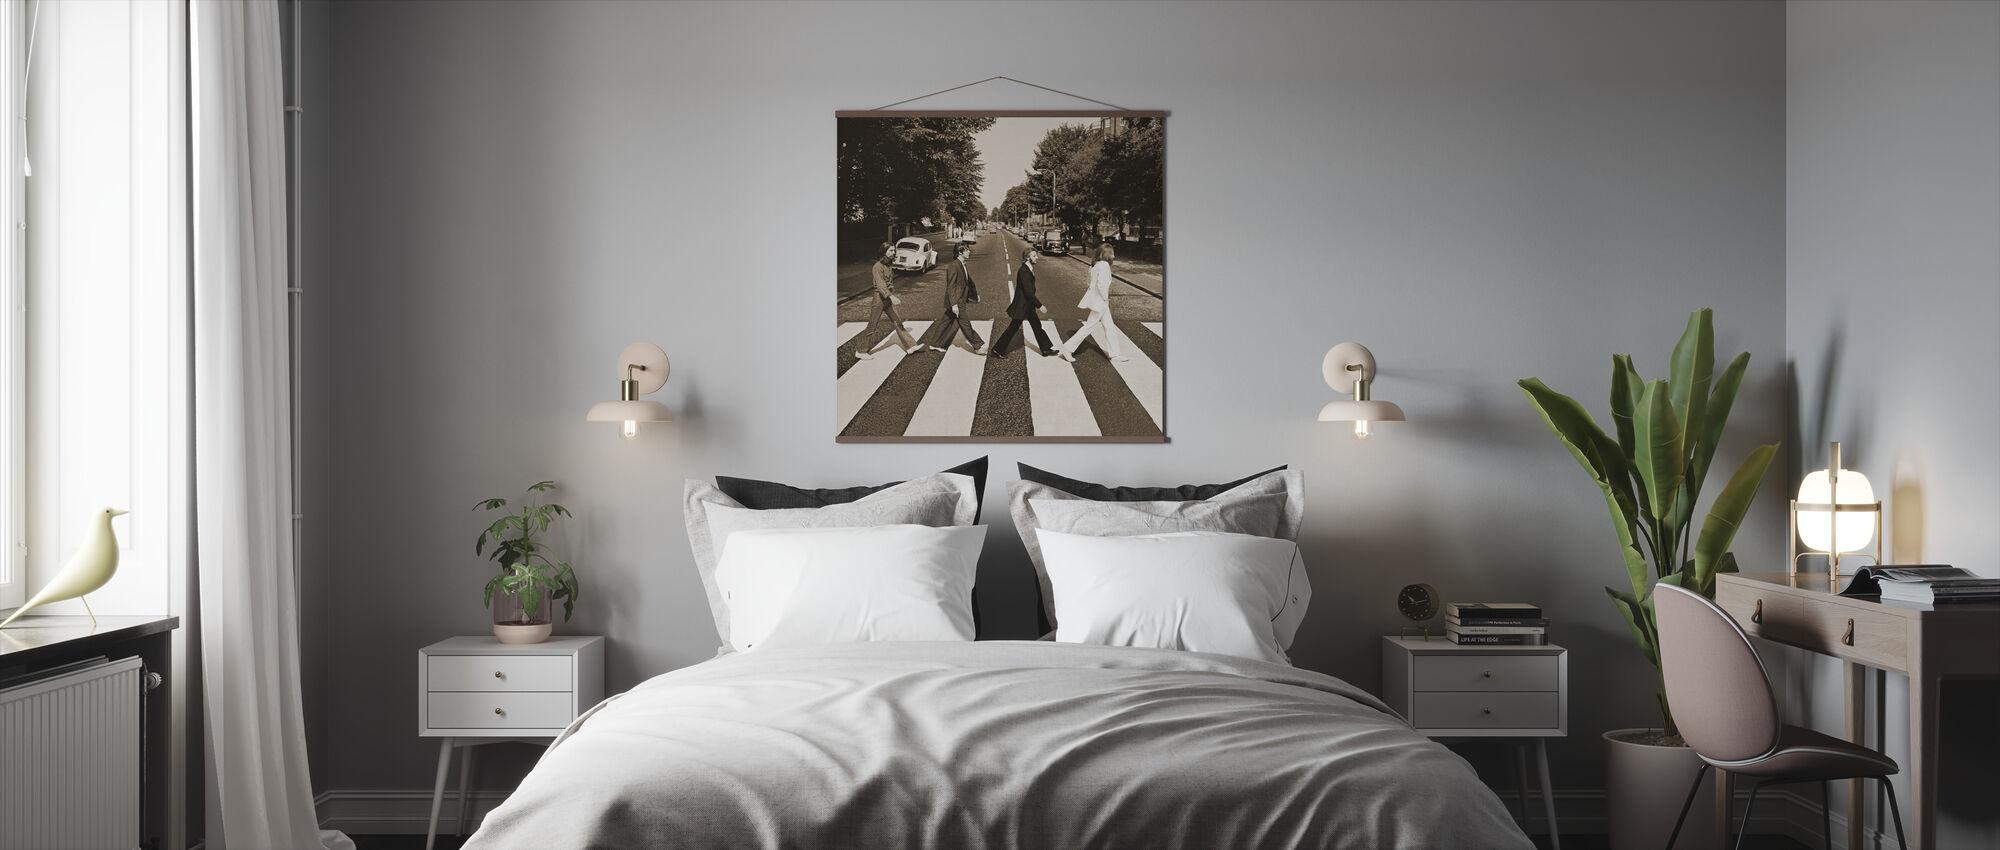 Beatles - Abbey Road Sepia - Plakat - Soverom